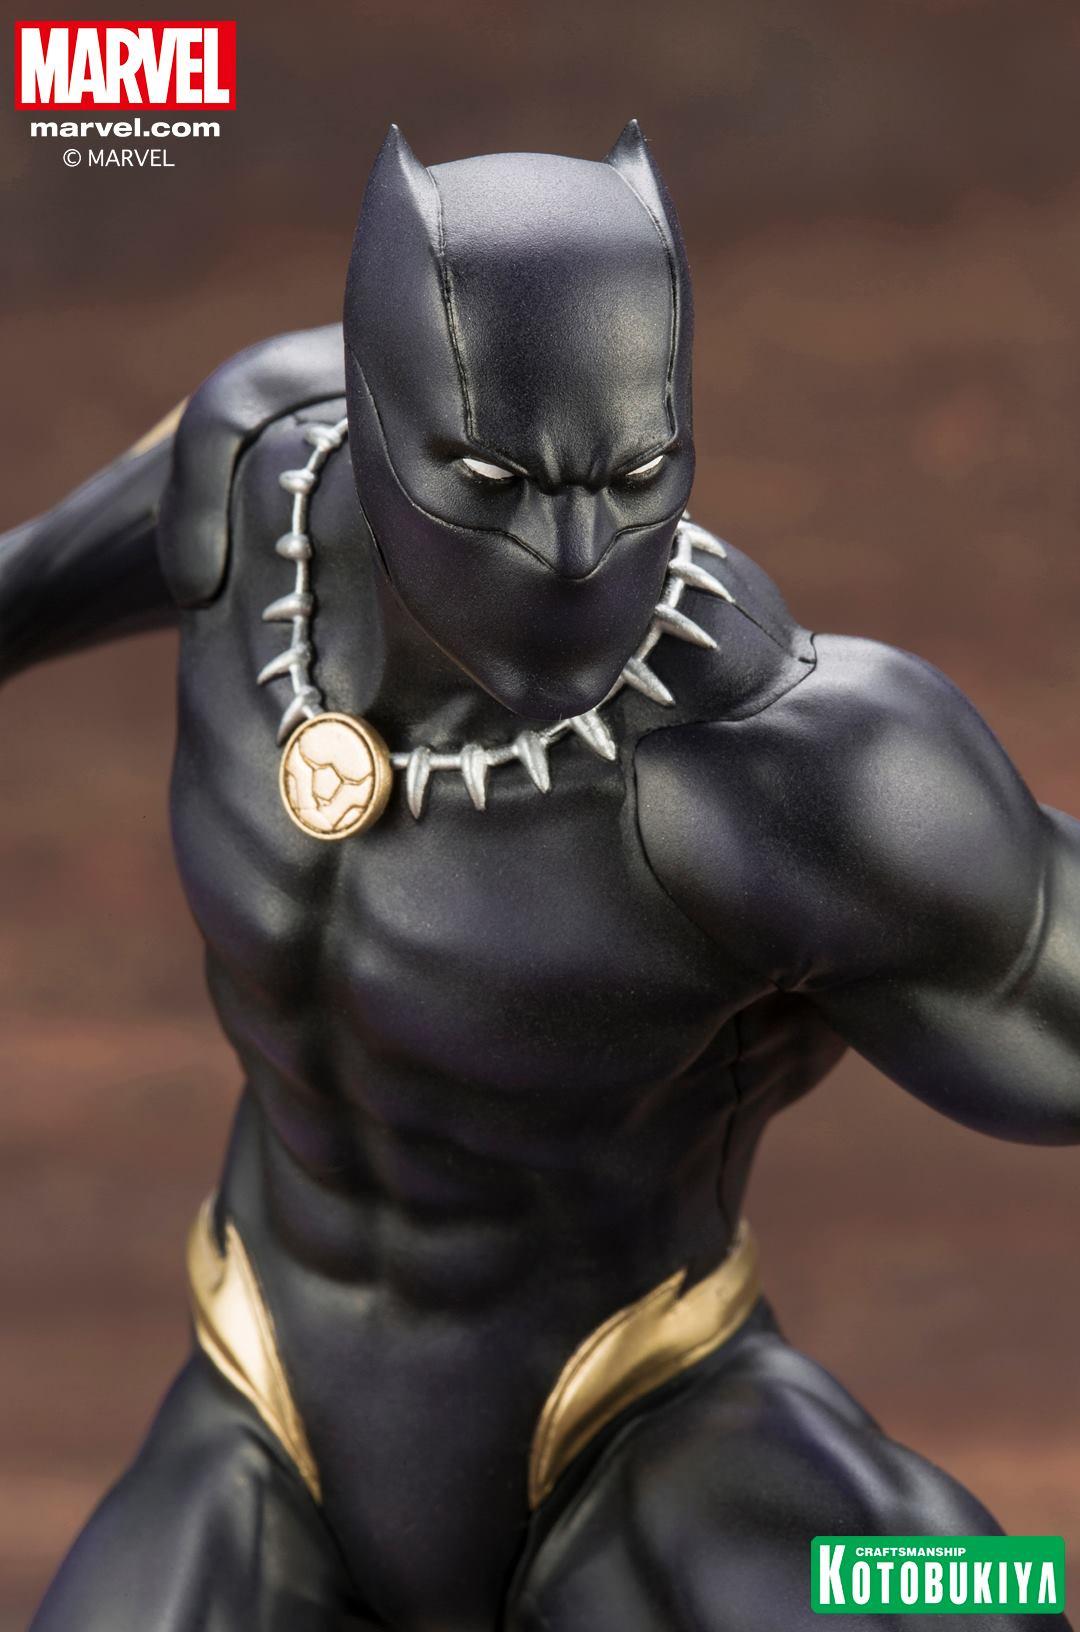 Kotobukiya Black Panther Artfx Statue Up For Order